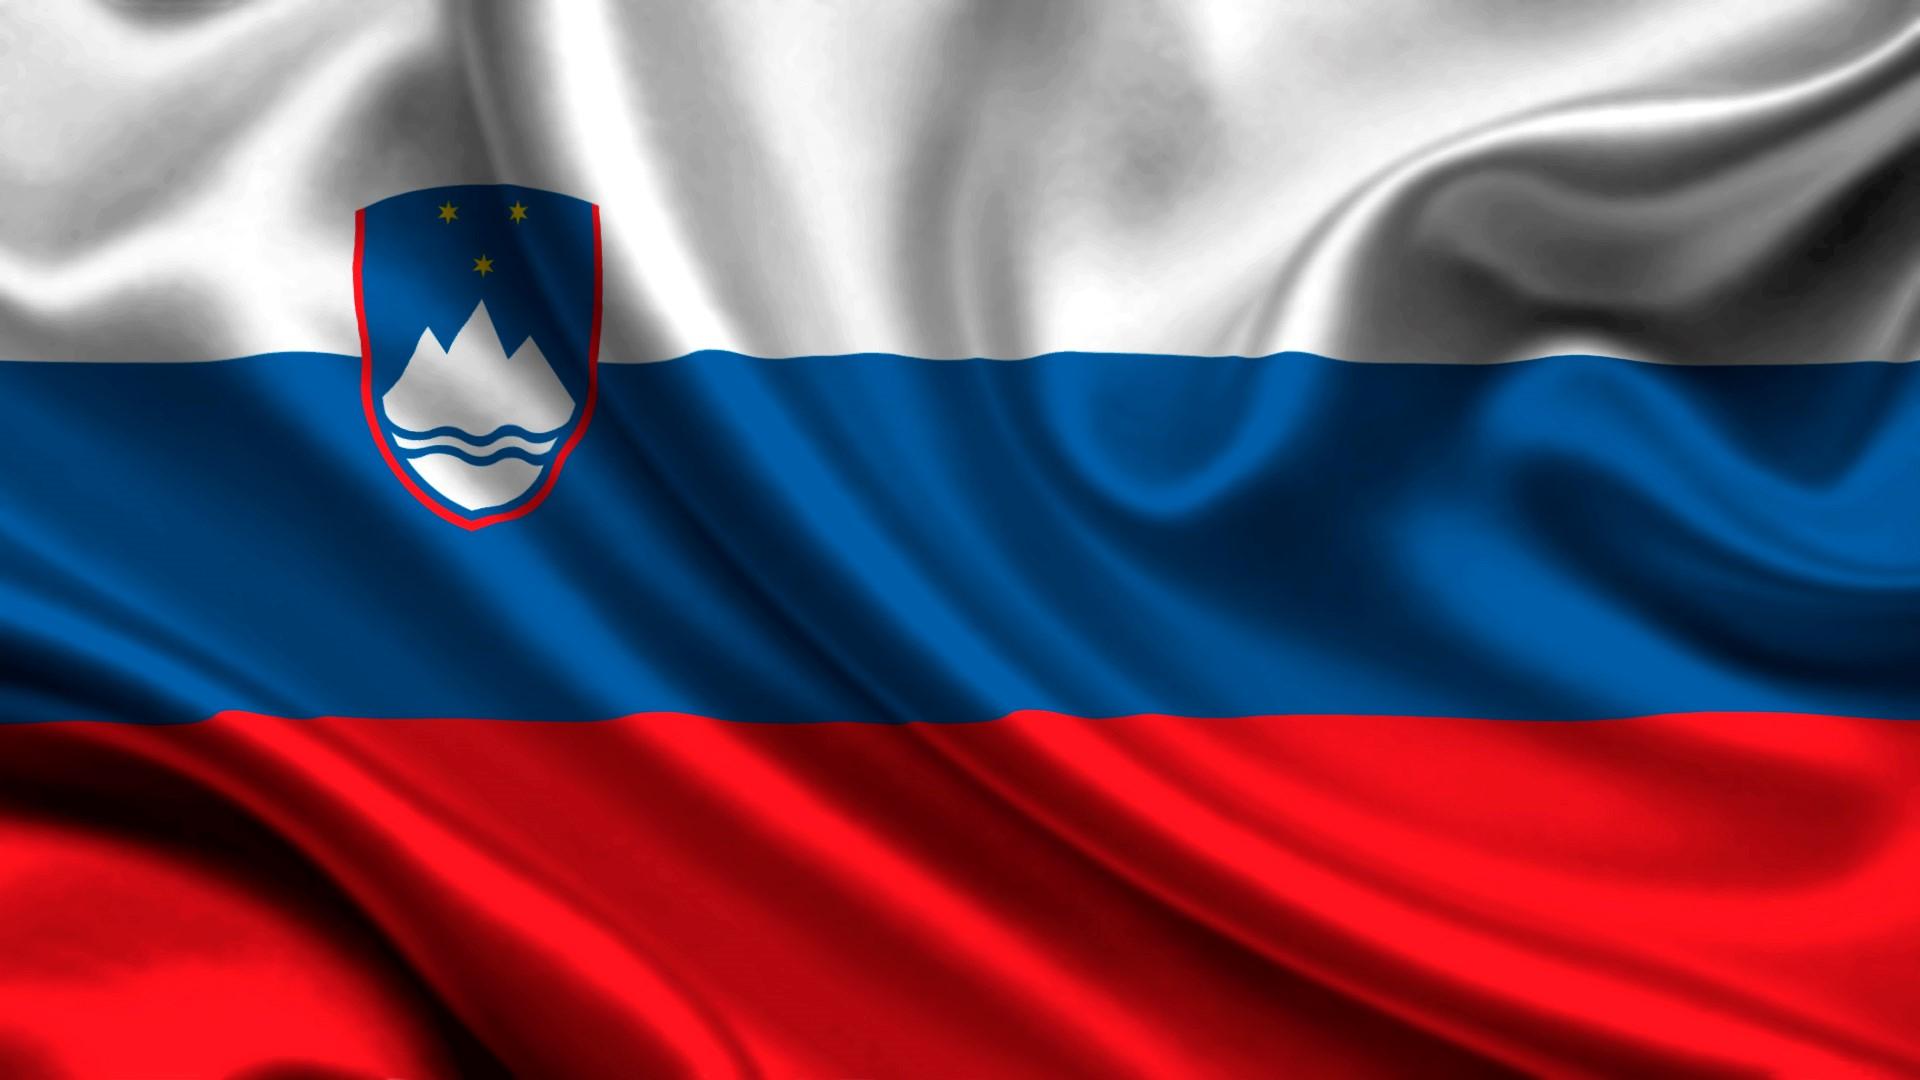 پرچم اسلوونی